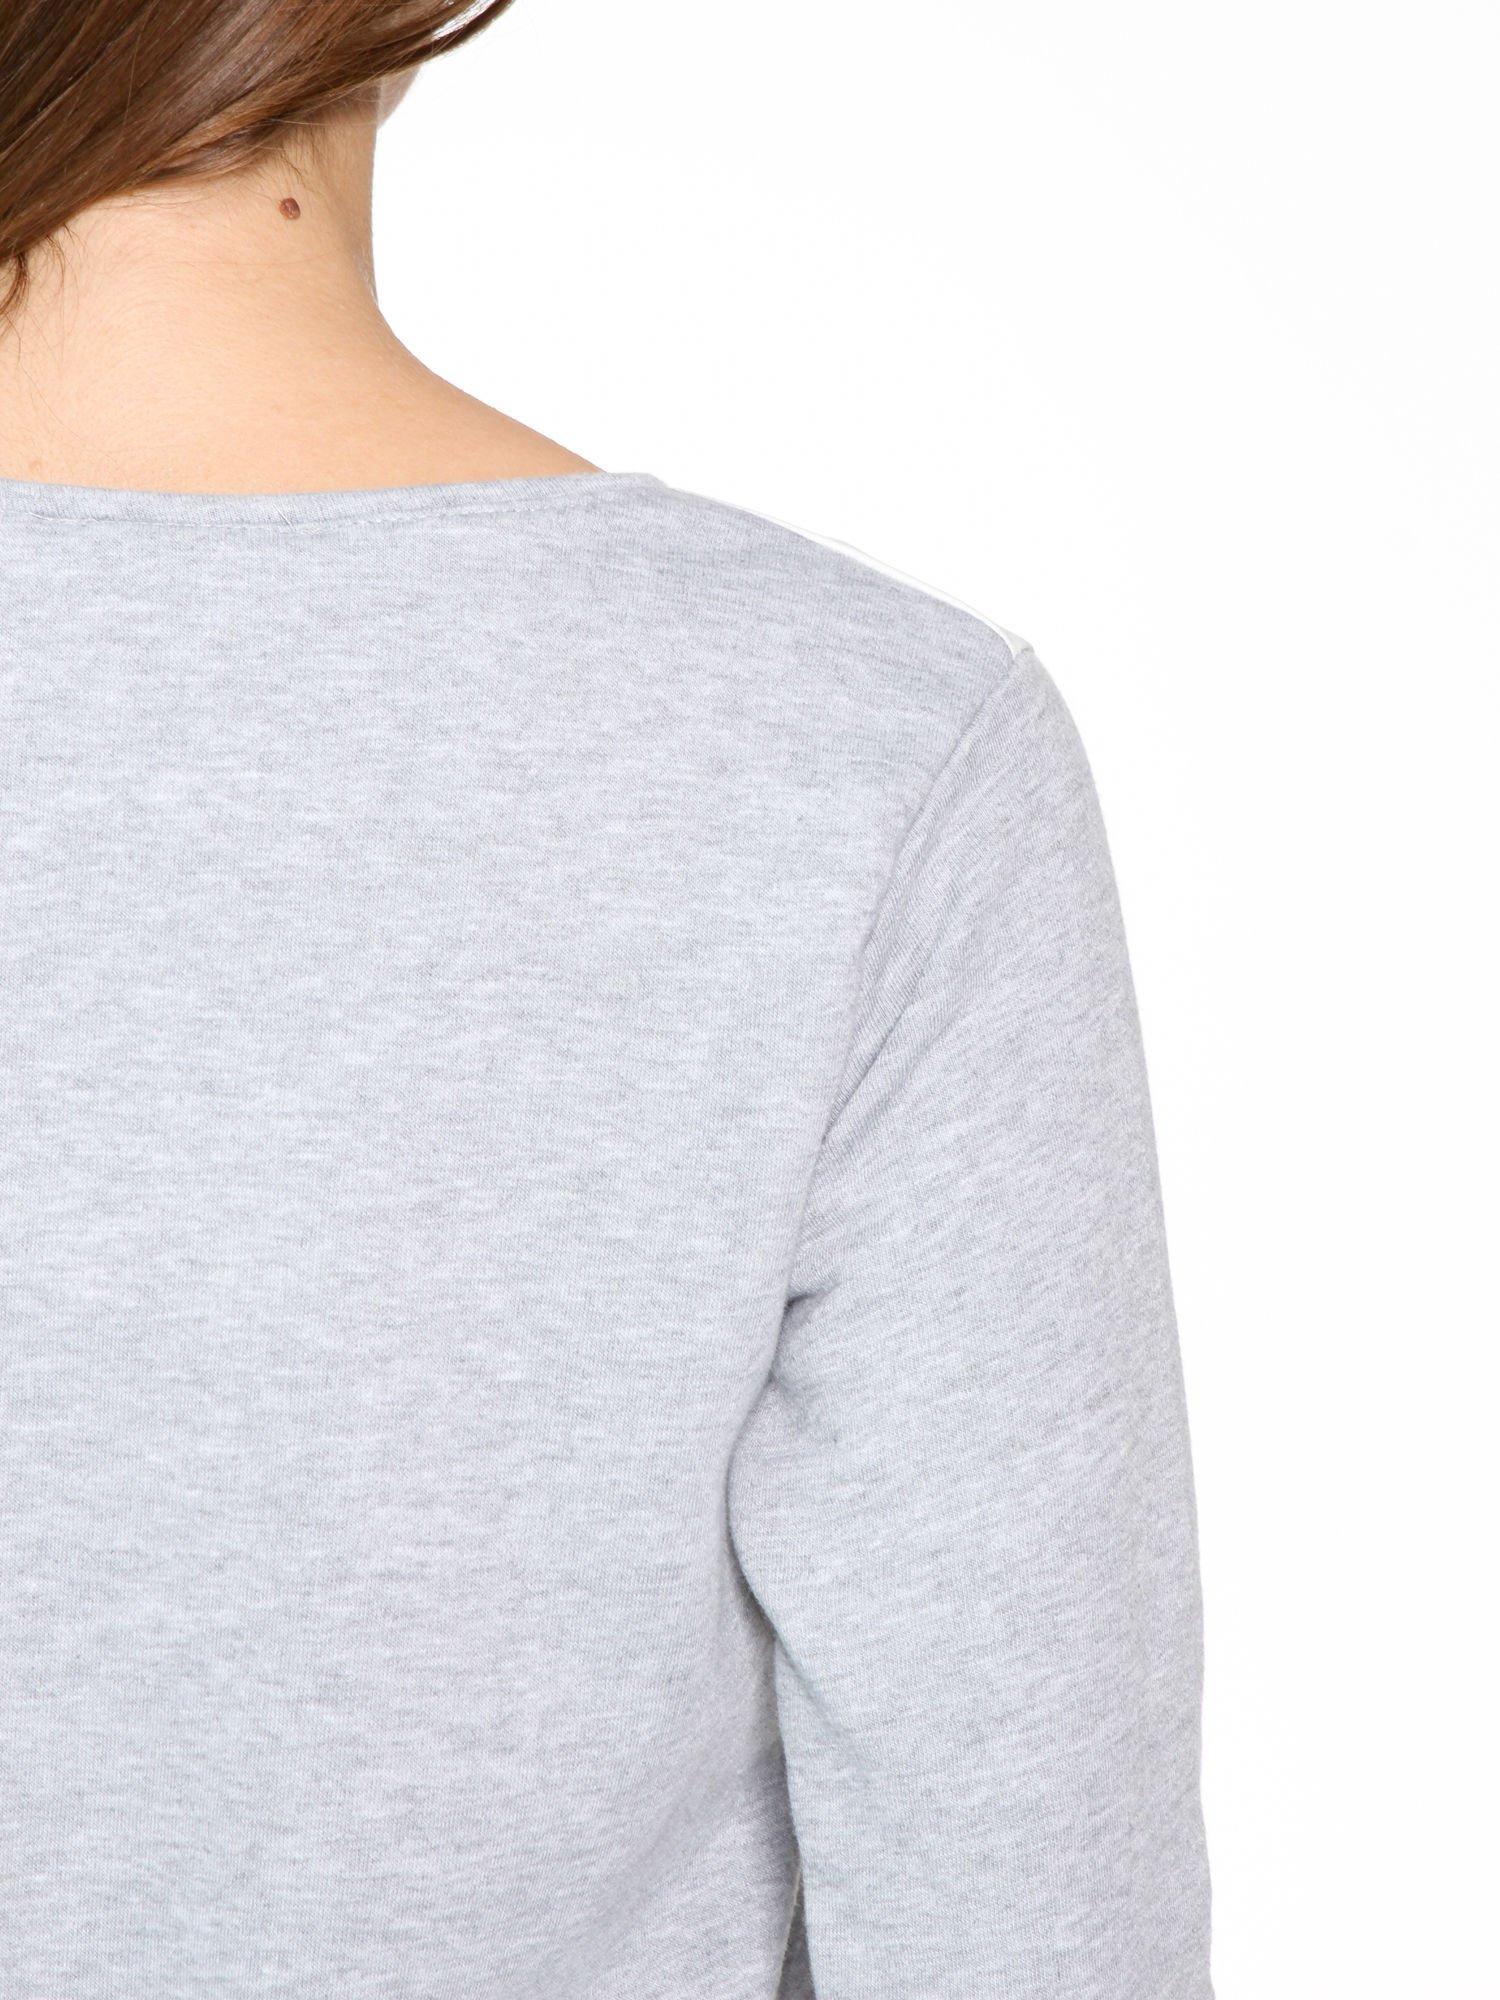 Szara dresowa bluza z nadrukiem kota i napisem QUEEN                                  zdj.                                  10